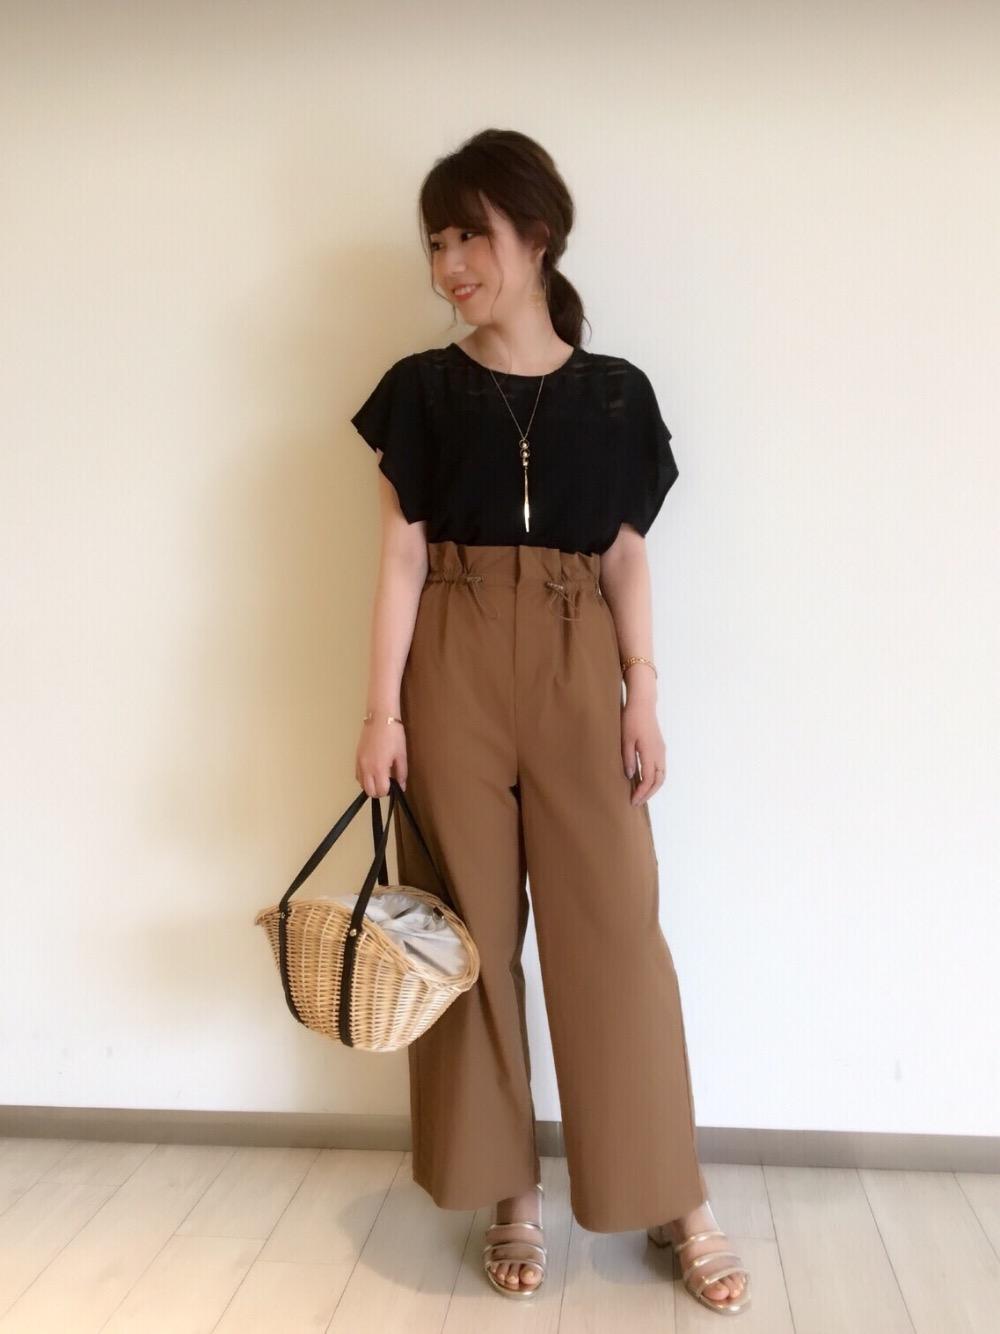 Perle Pecheグランフロント大阪店